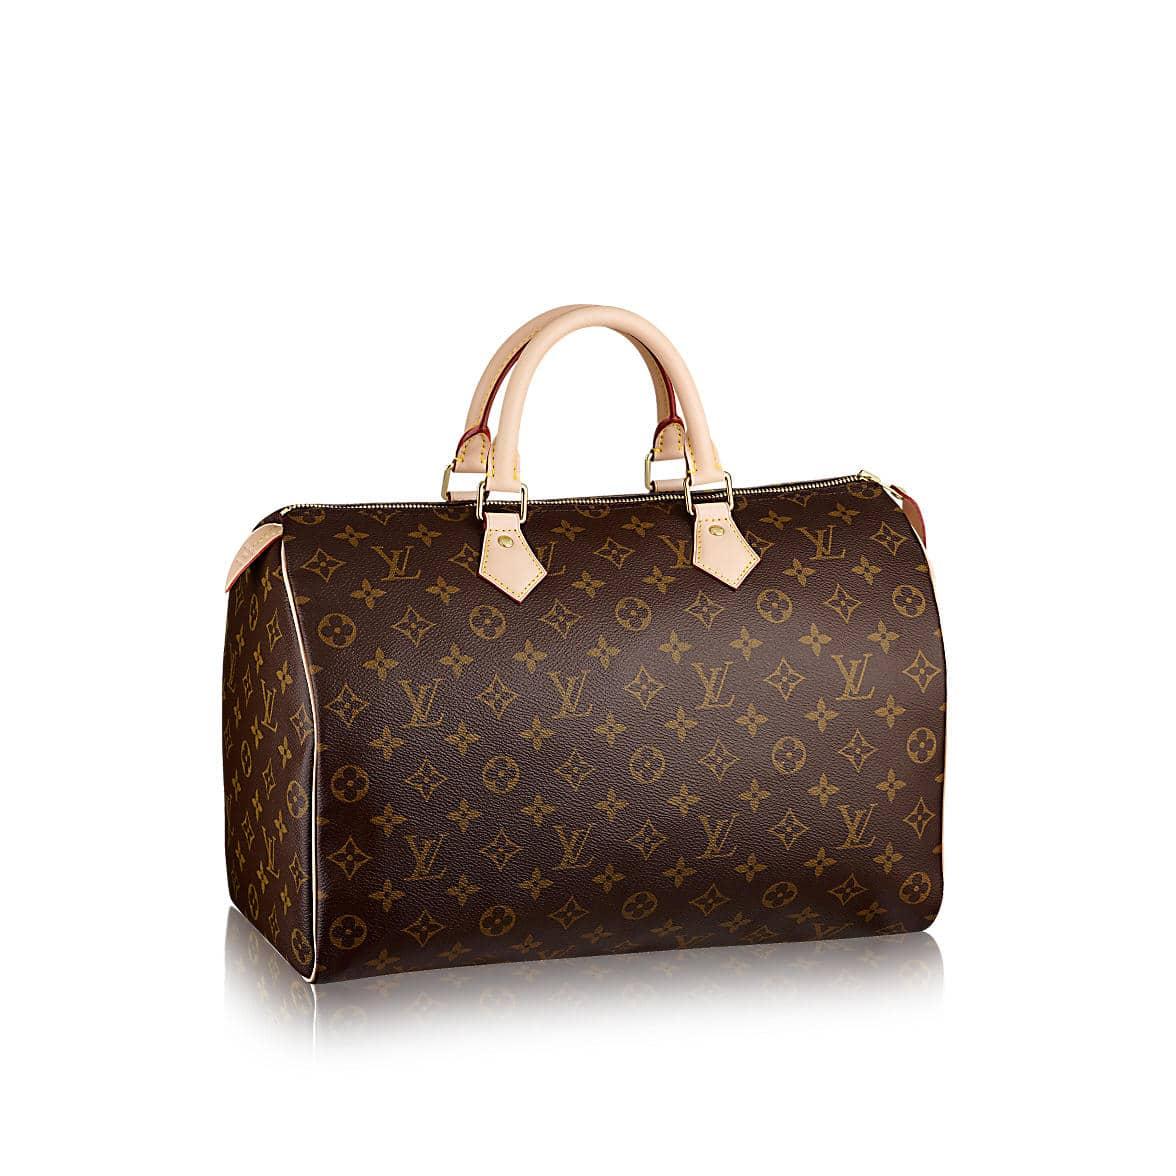 Louis Vuitton Speedy 35 Monogram Bag Purse